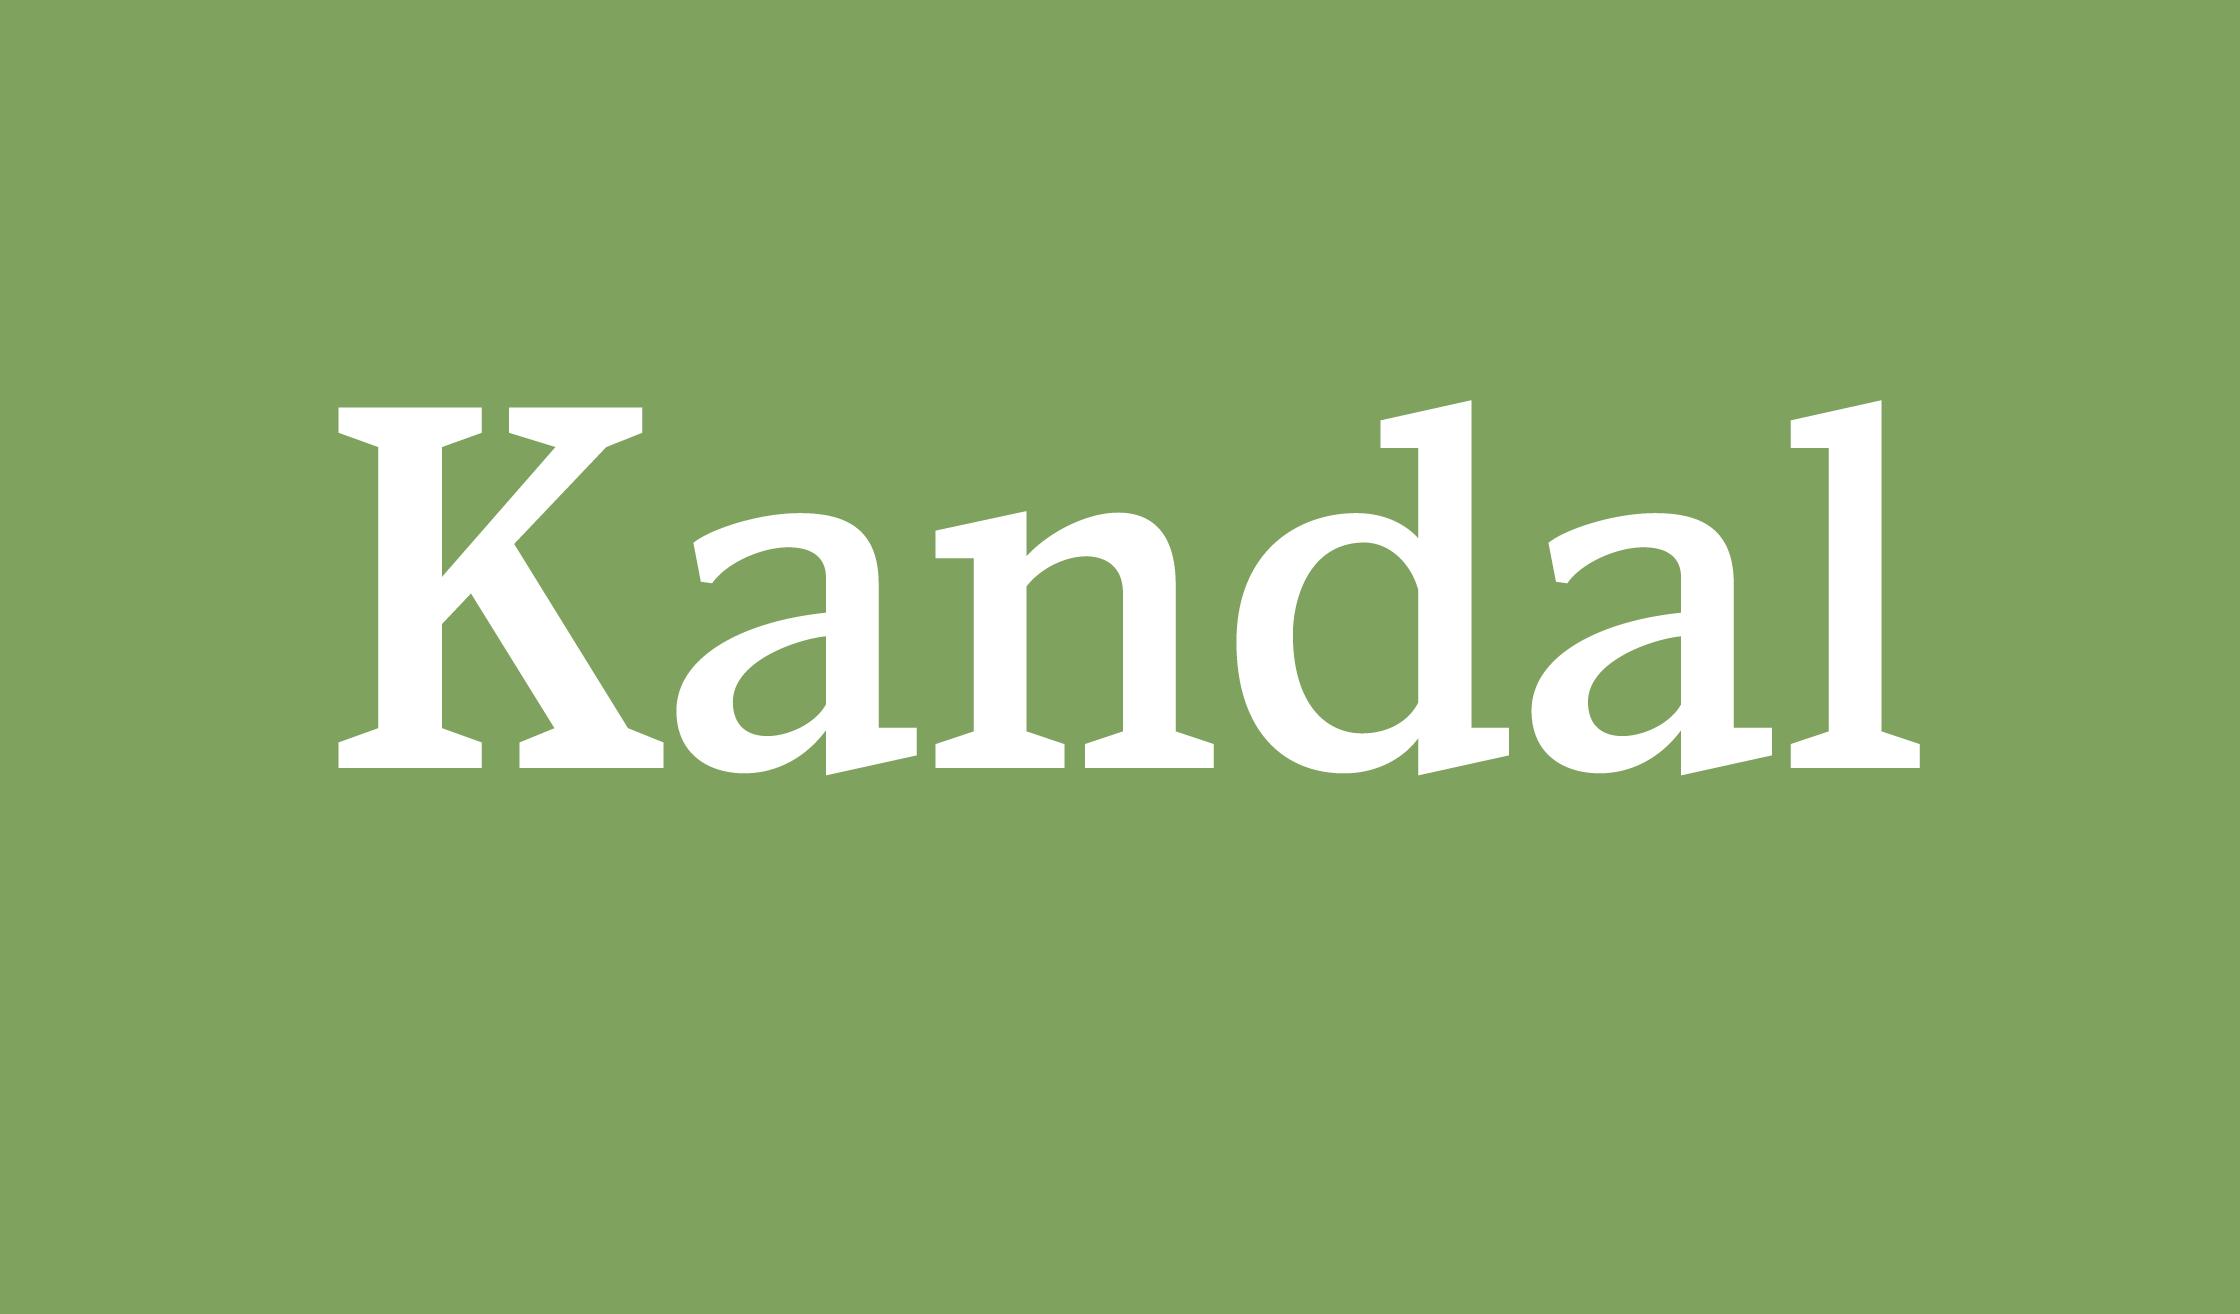 Kandal Banner Name 2240